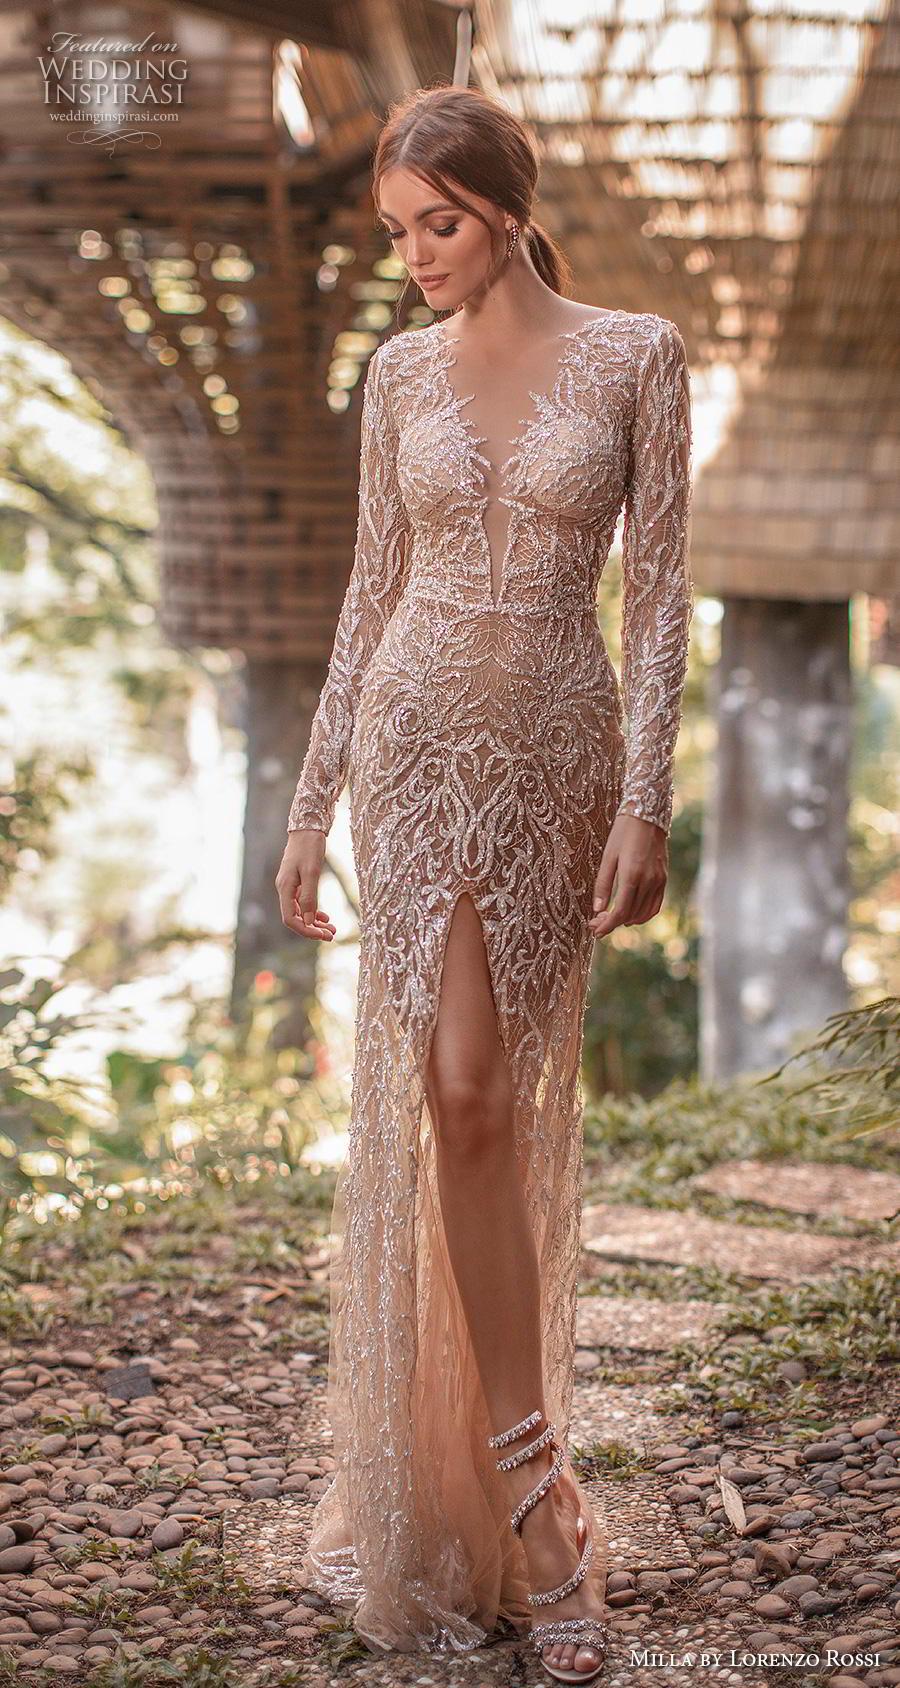 lorenzo rossi 2019 milla bridal long sleeves deep v neck full embellishment slit skirt glamorous sexy gold sheath wedding dress covered back sweep train (11) mv